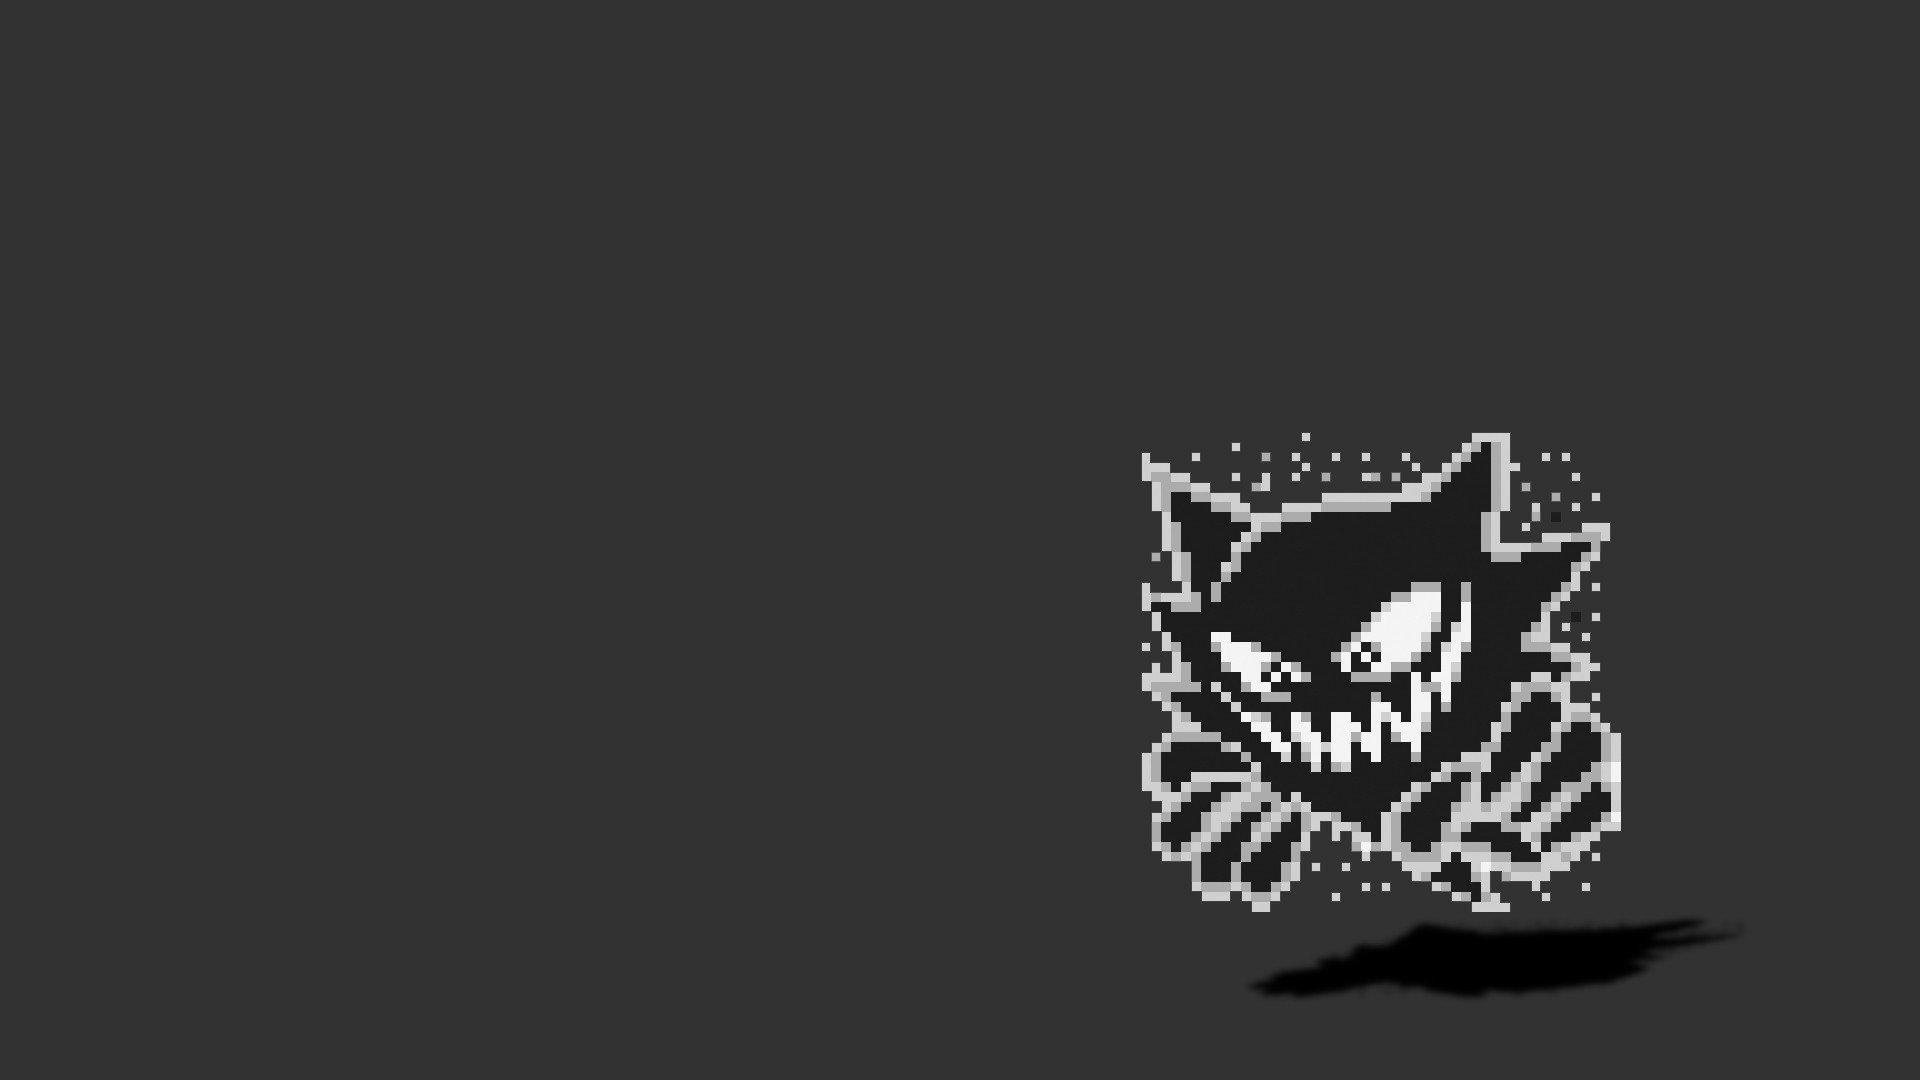 29 Haunter (Pokémon) HD Wallpapers | Backgrounds - Wallpaper Abyss